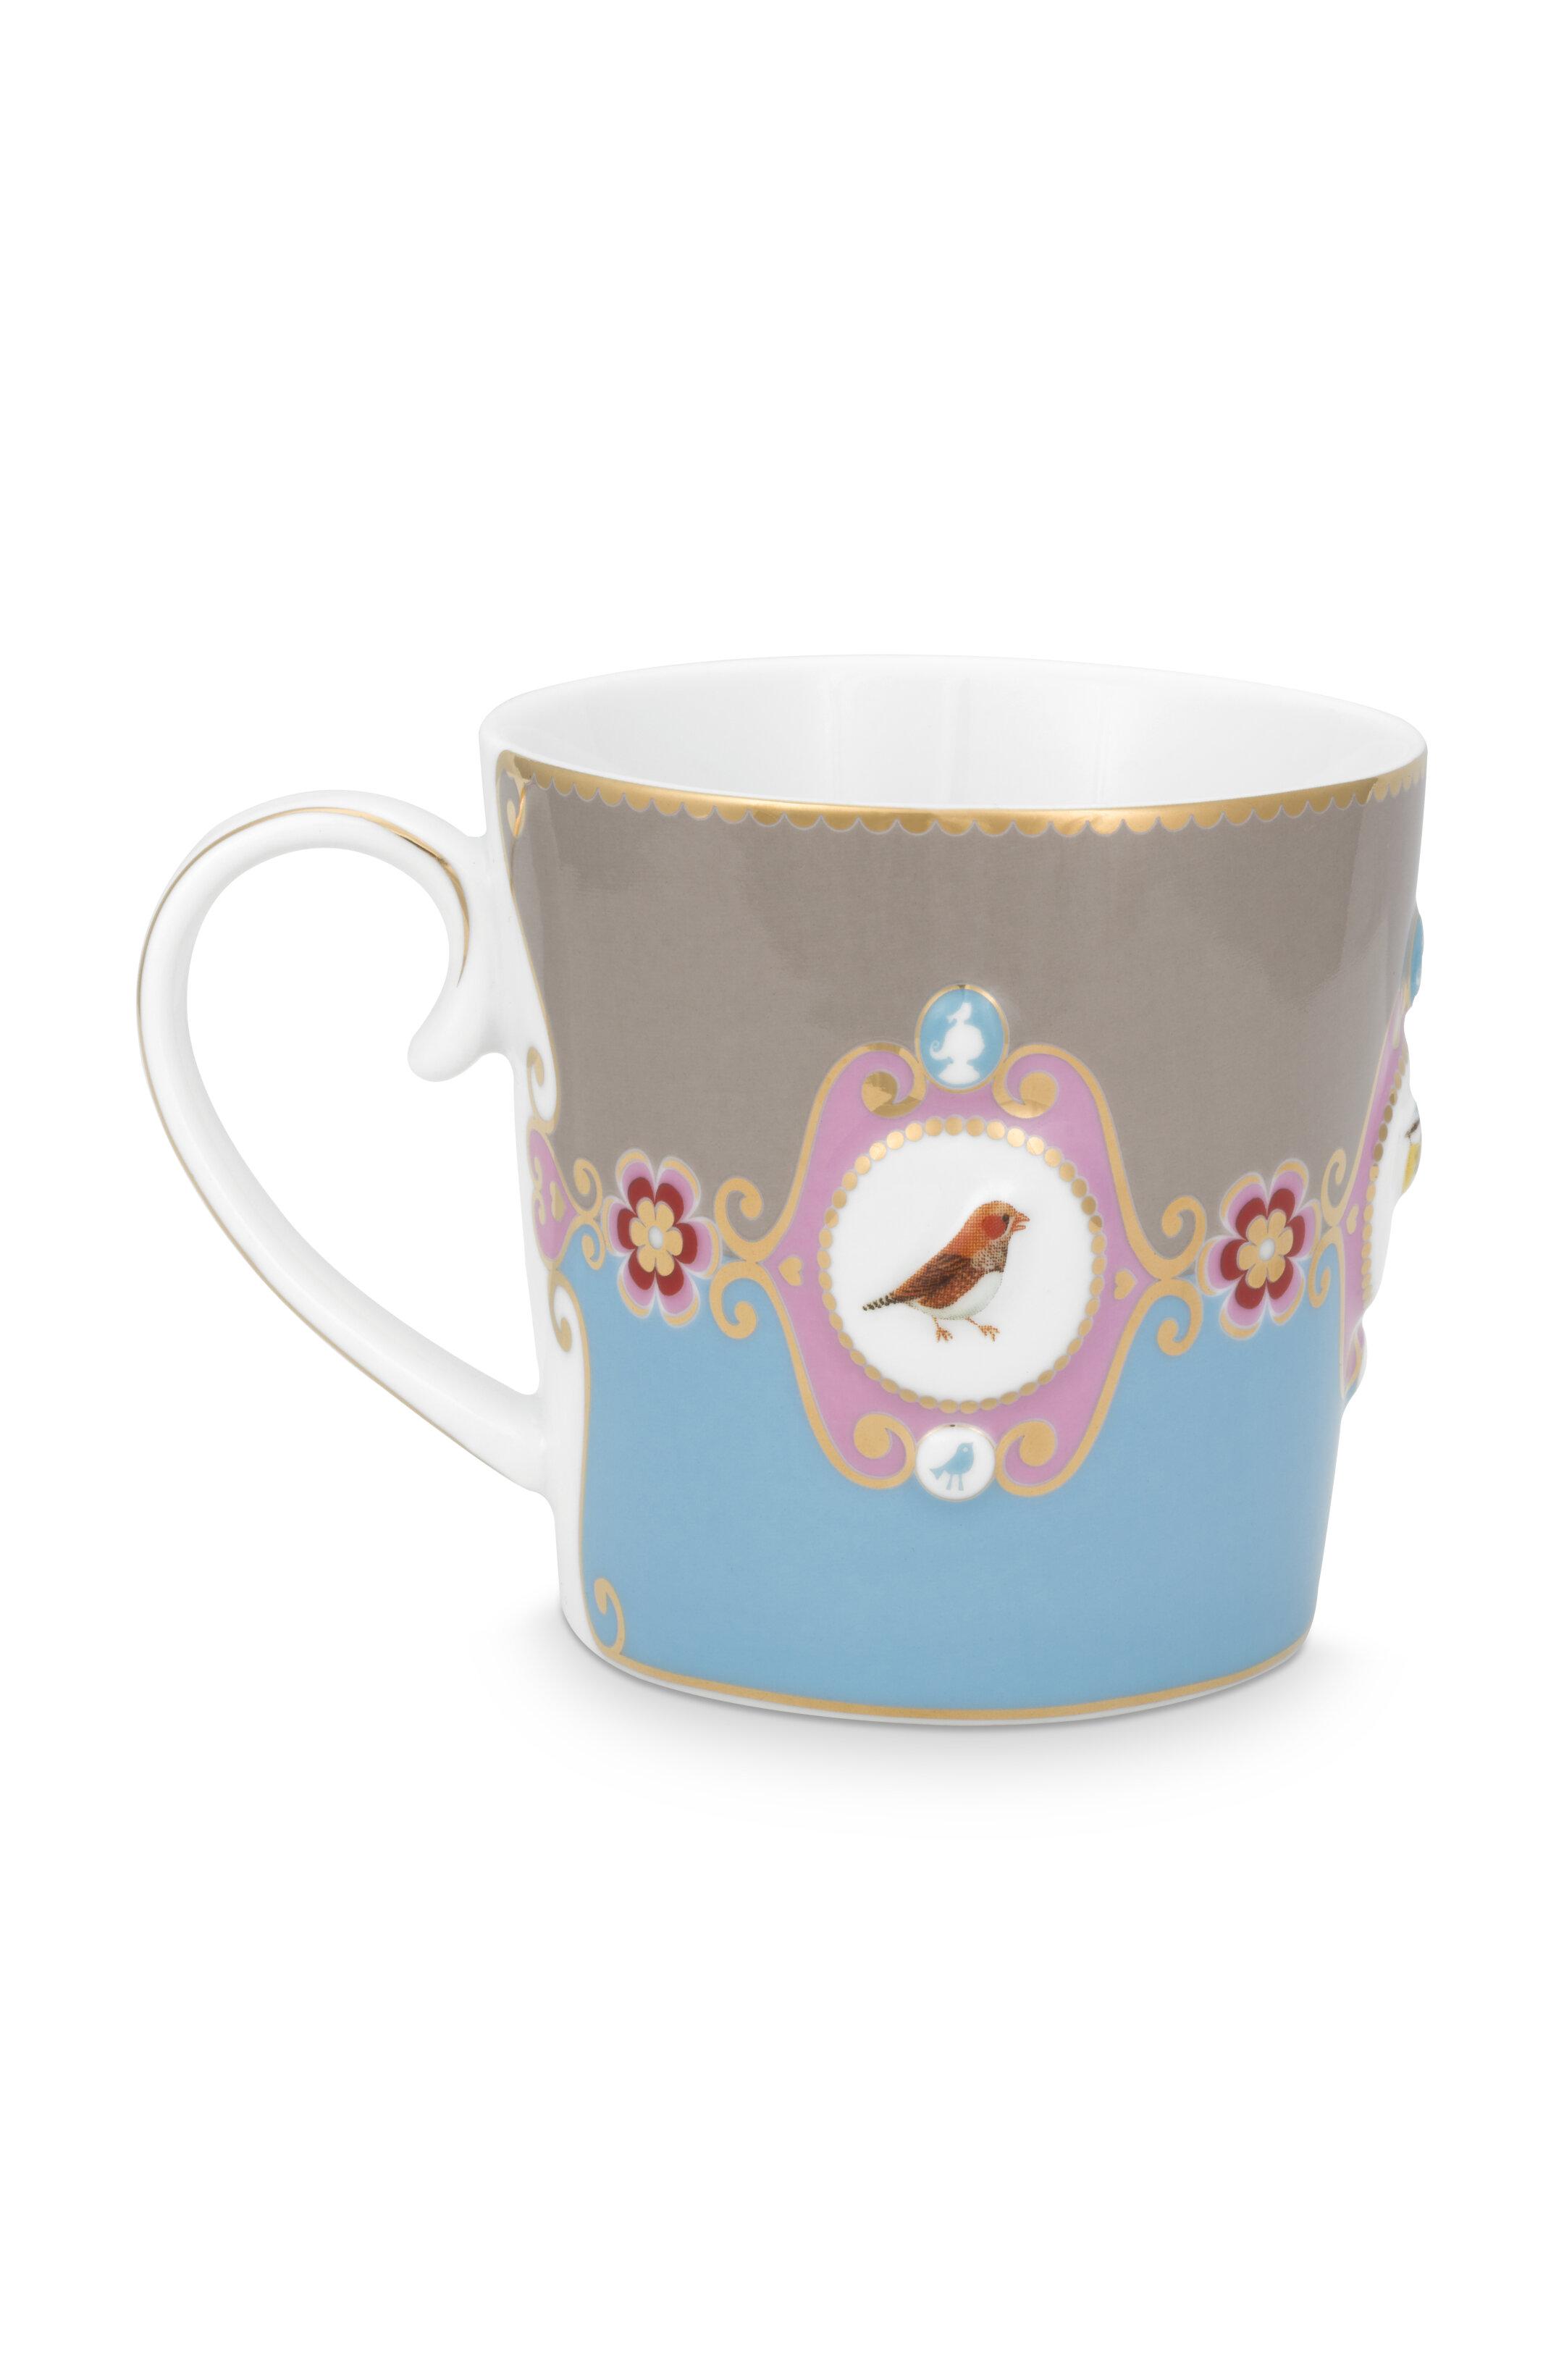 Pip Studio Love Birds Tasse Klein Medaillon Blau-Khaki